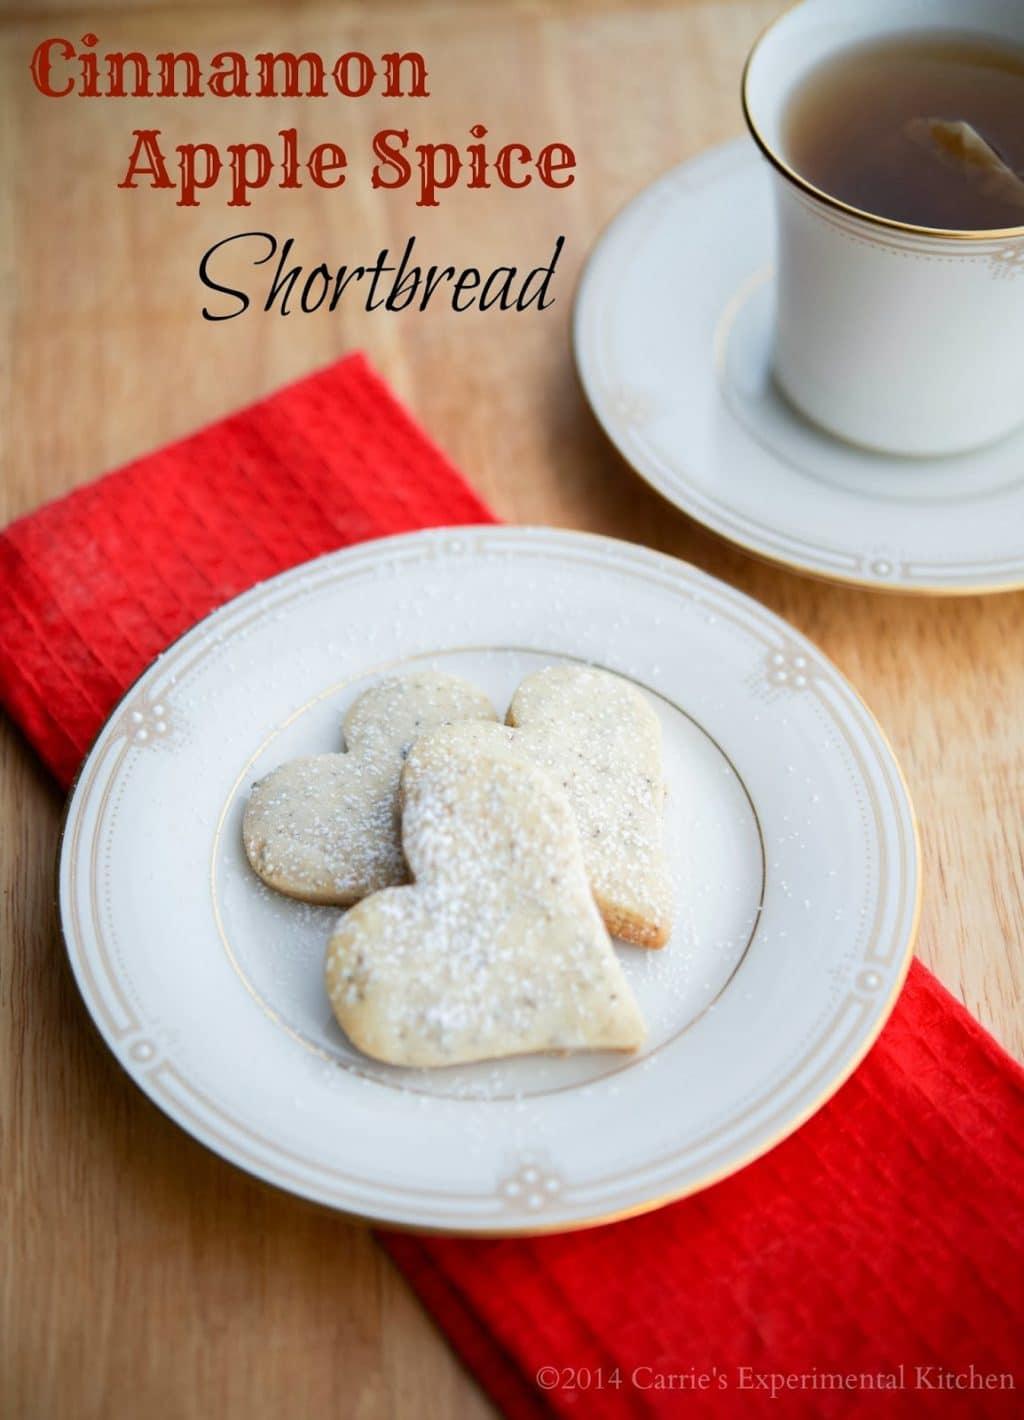 Cinnamon Apple Spice Shortbread - Carrie's Experimental Kitchen